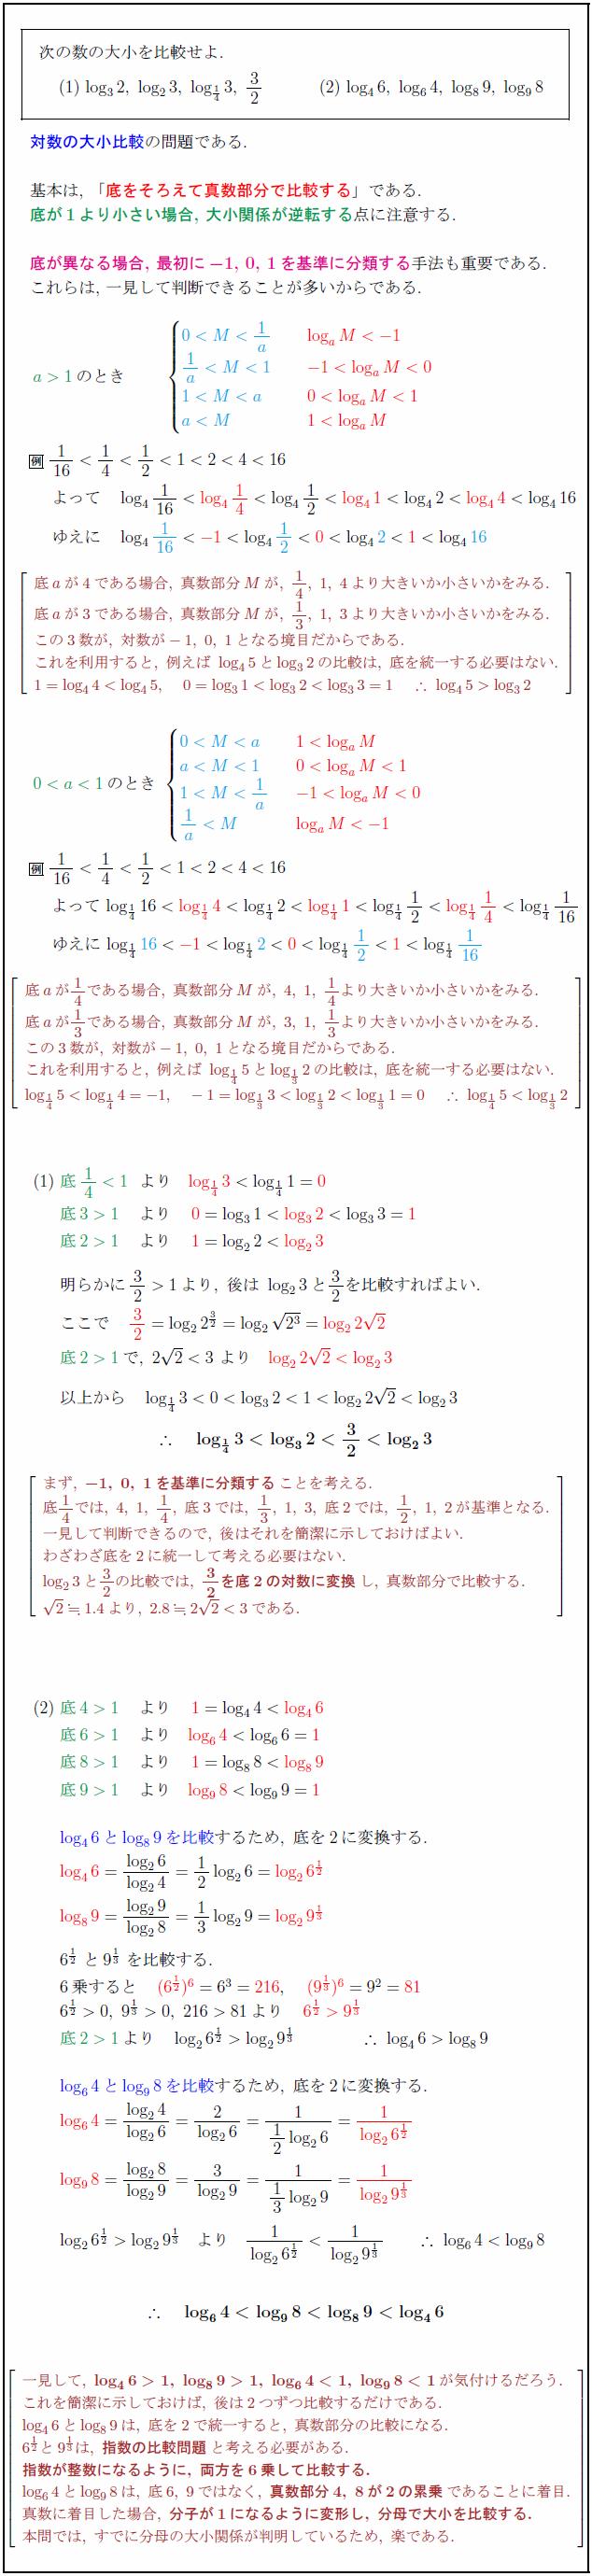 logarithm-comparison